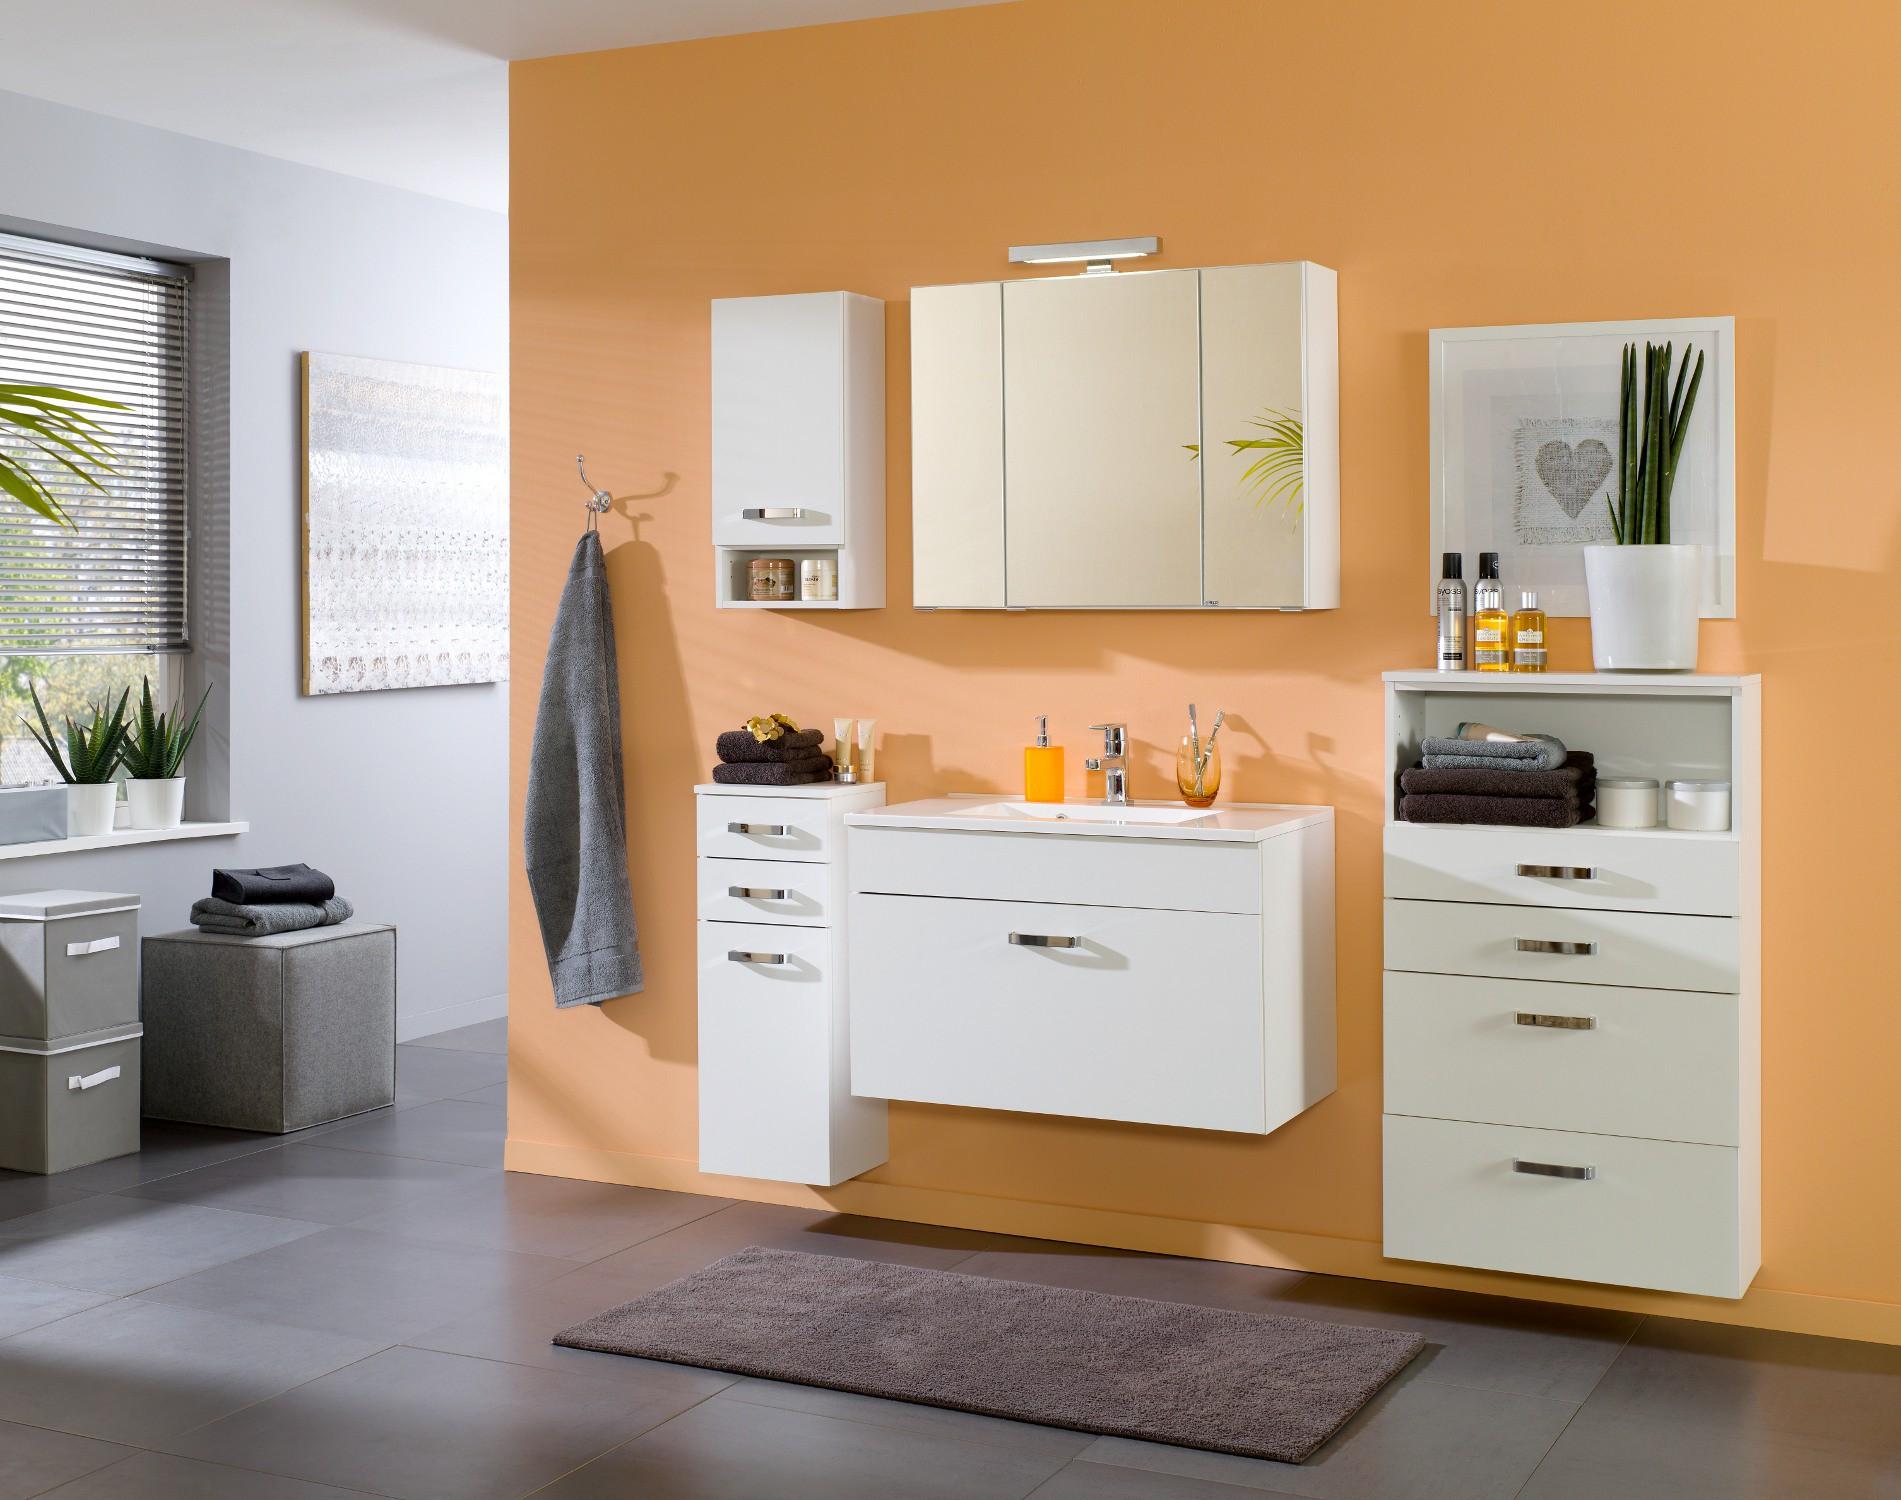 bad midischrank capri 1 t rig 2 schubladen 30 cm breit wei bad bad midischr nke. Black Bedroom Furniture Sets. Home Design Ideas